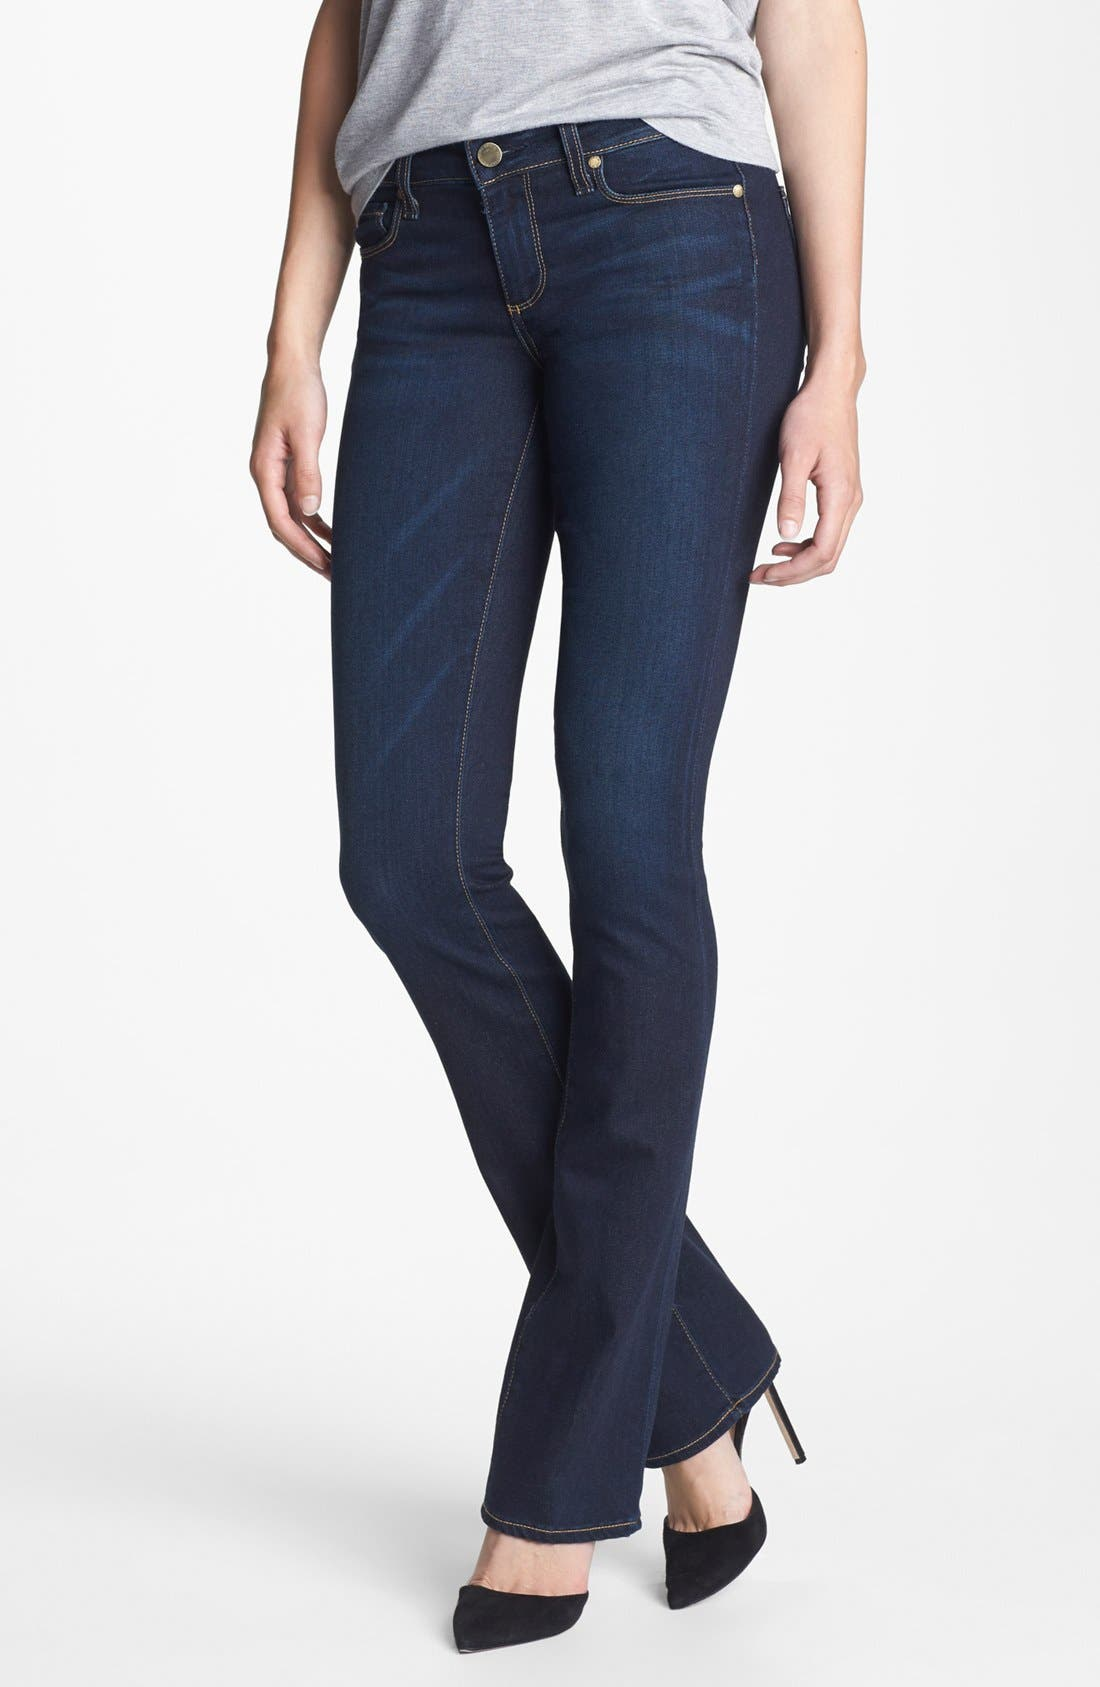 Alternate Image 1 Selected - Paige Denim 'Manhattan' Bootcut Jeans (Surface)